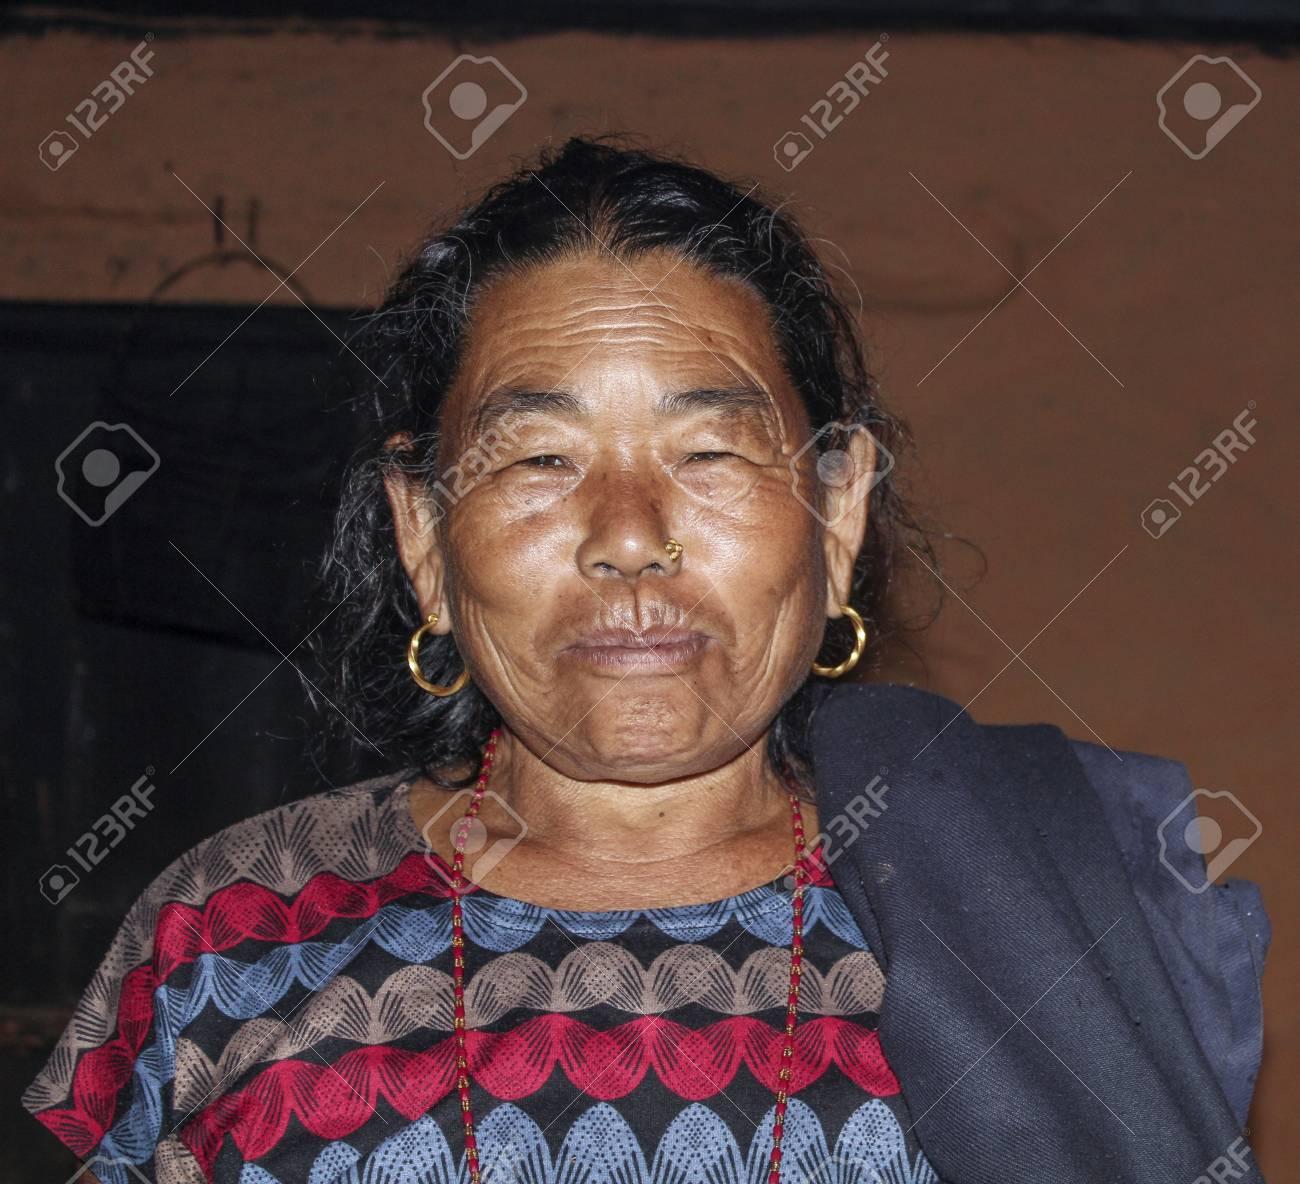 Jomson Nepal Oct 13 2013 Portrait Of Old Nepalese Woman